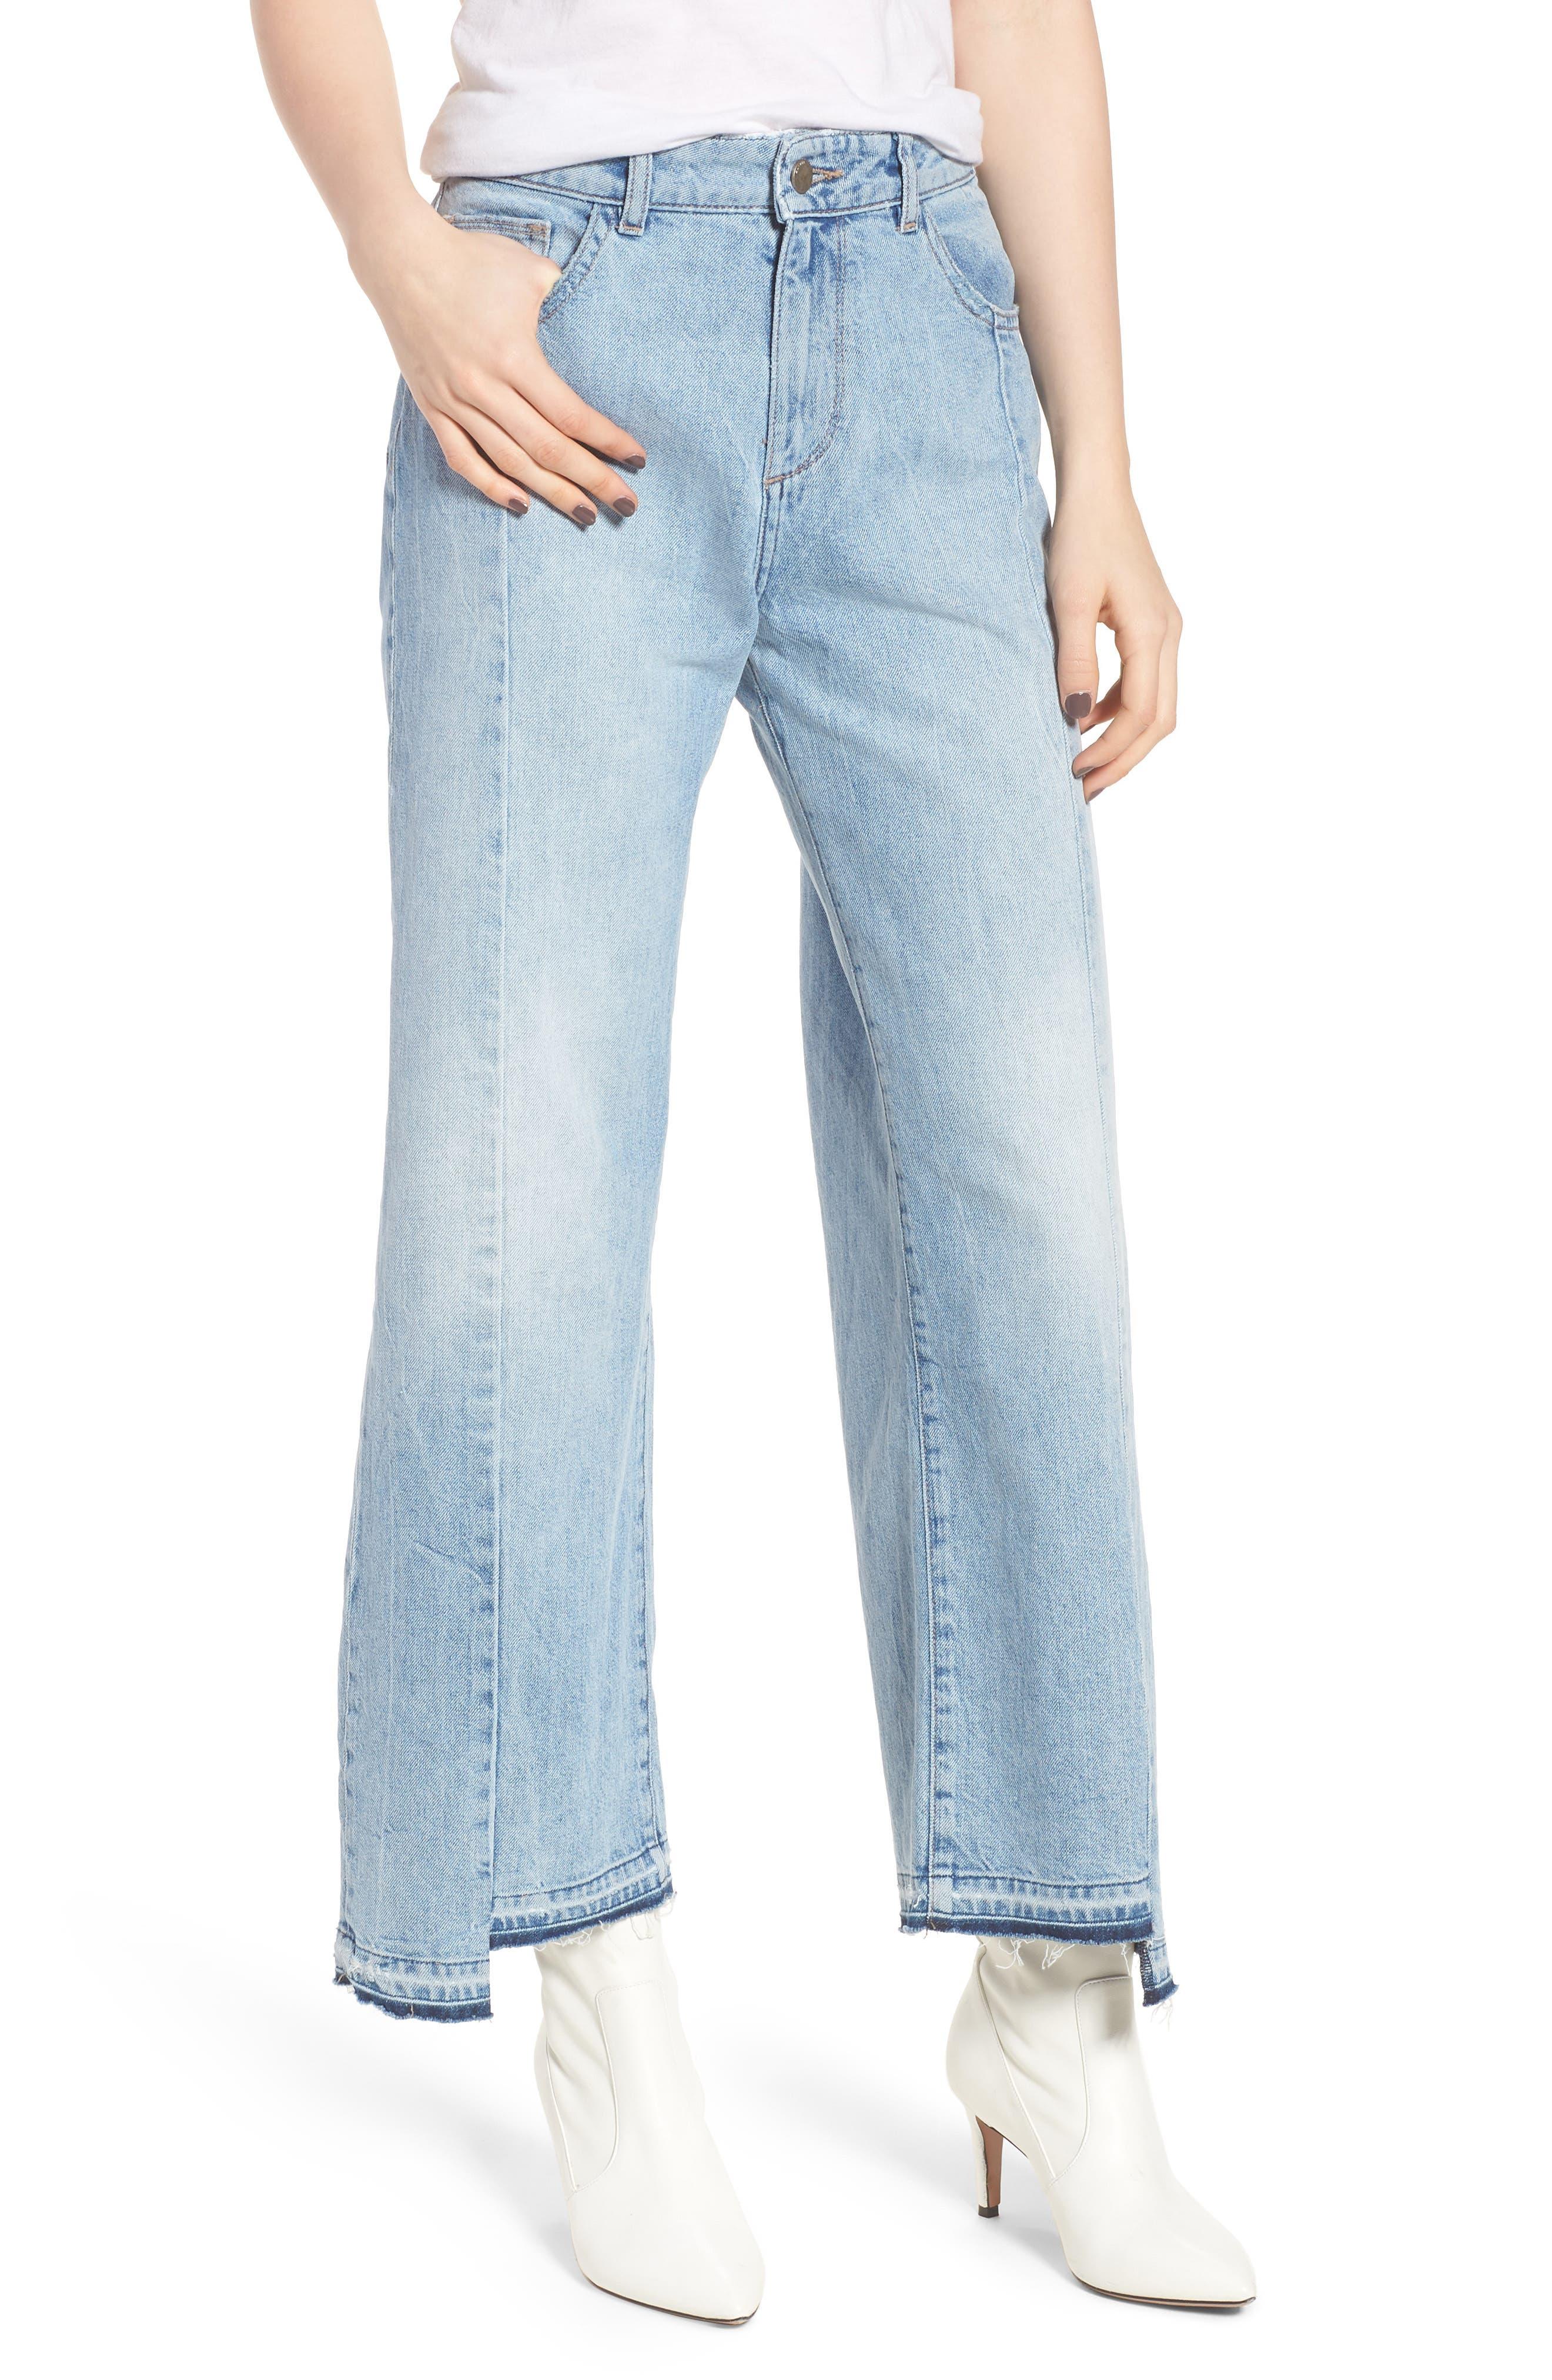 Hepburn High Waist Wide Leg Jeans,                         Main,                         color, Oldtown